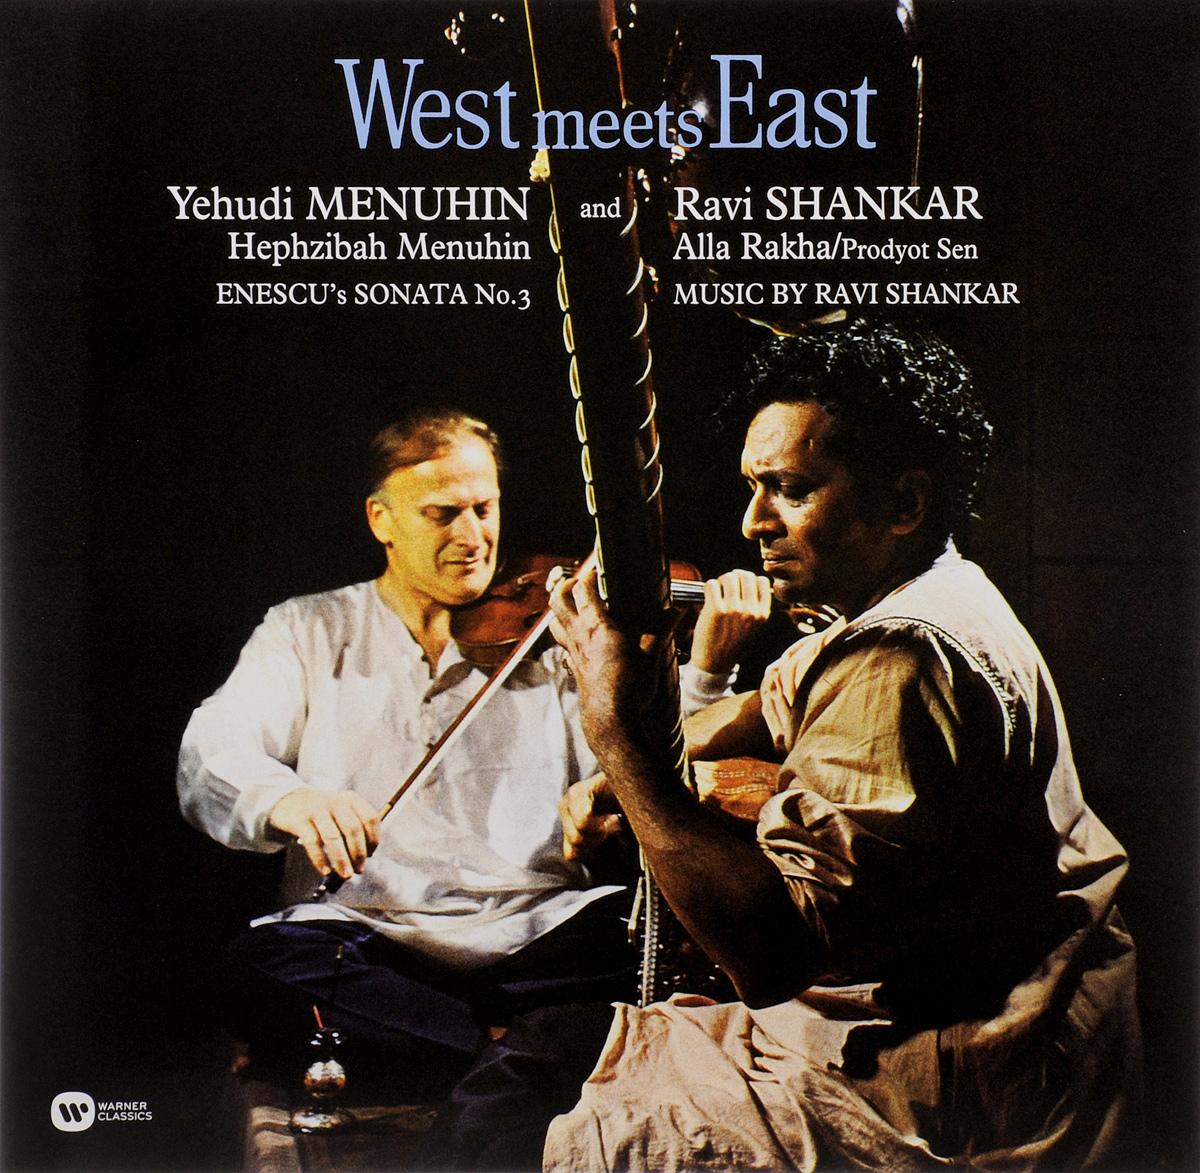 цены на Иегуди Менухин,Алла Ракха,Рави Шанкар,Хепзиба Менухин Yehudi Menuhin And Ravi Shankar. West Meets East (LP)  в интернет-магазинах